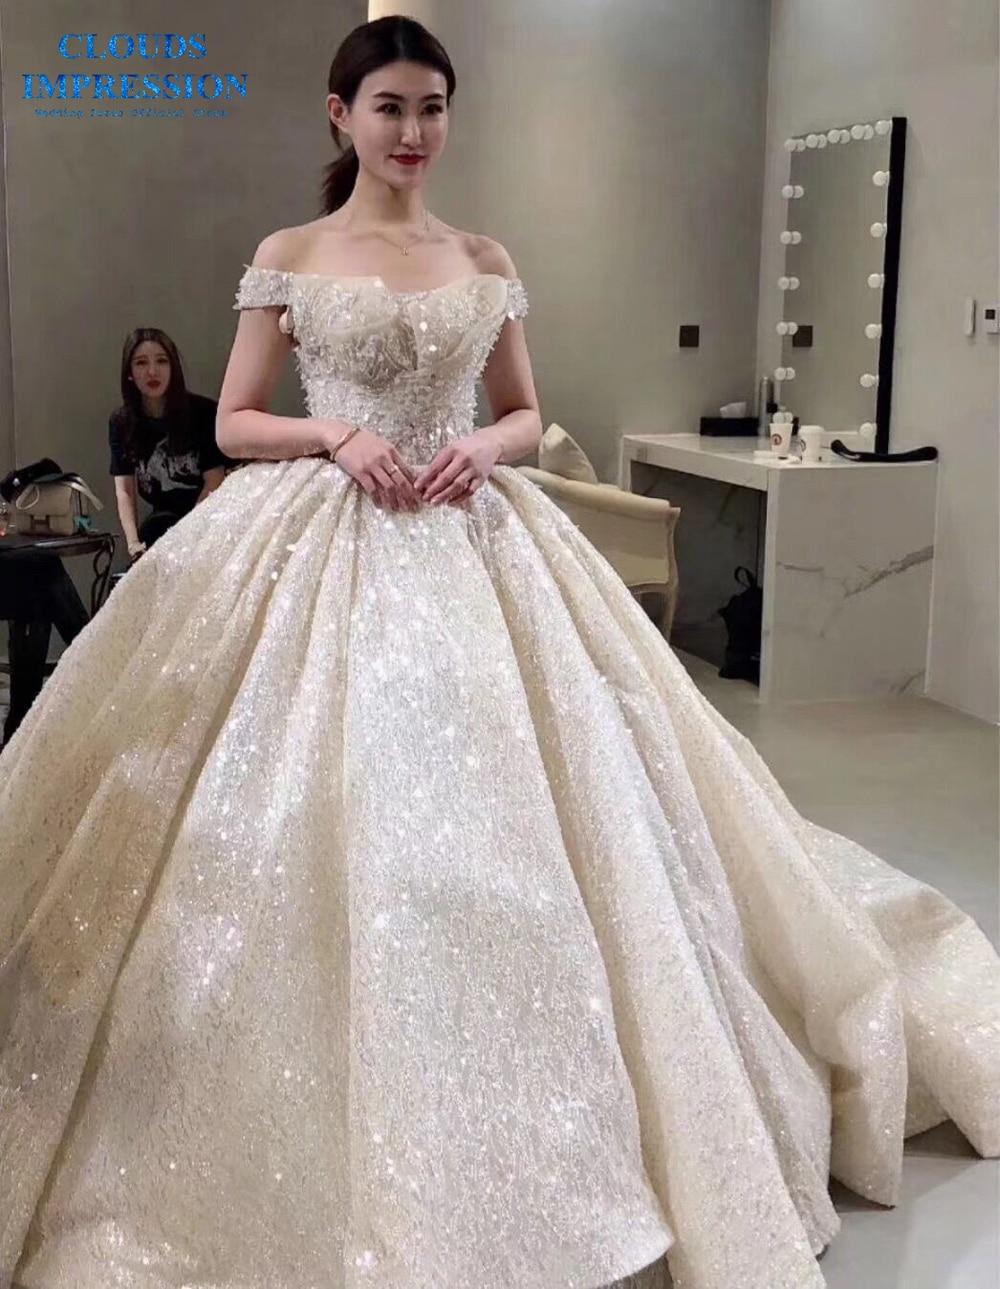 Luxury Ball Gown Wedding Dress 2019 Boat Neck Lace Gorgeous Beading Bridal Gowns Vestige De Noiva Royal Train